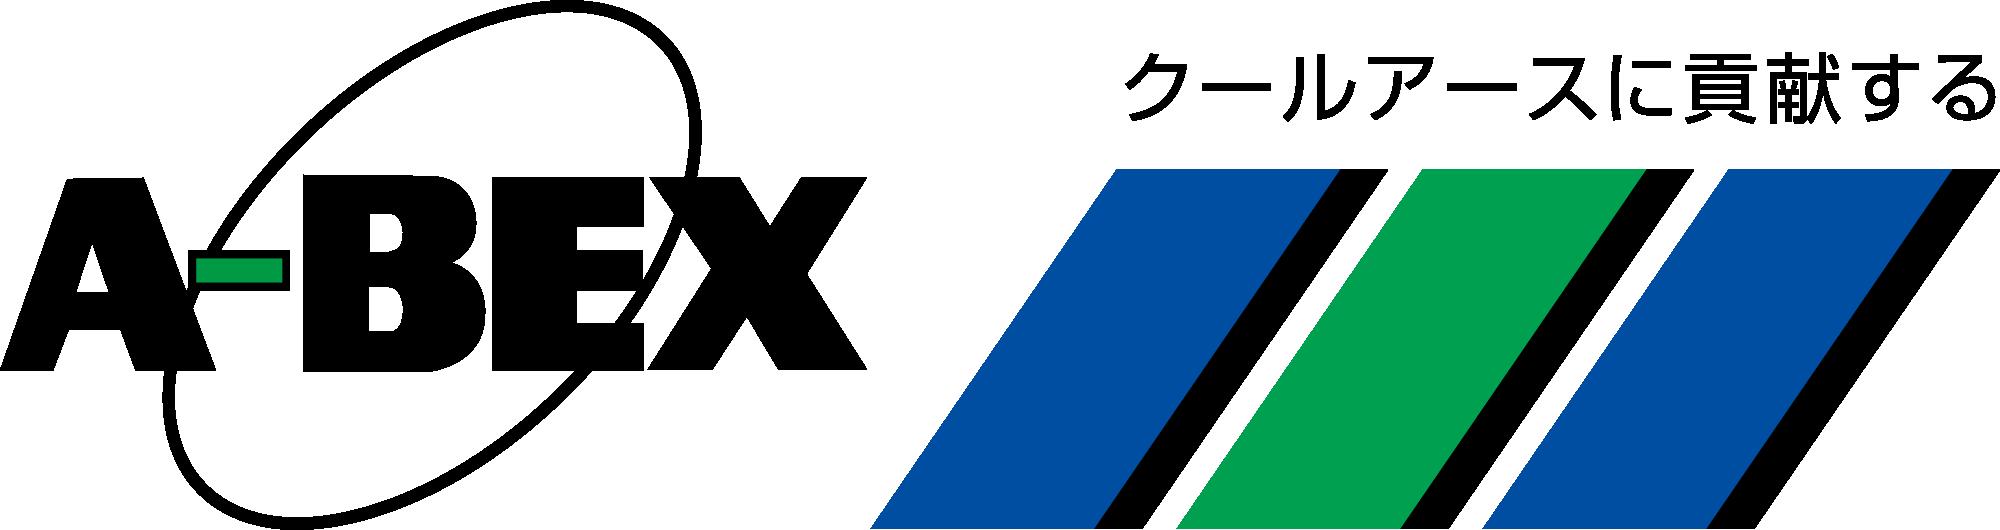 https://www.a-bex.com/wp/wp-content/uploads/2021/07/logo_a-bex-03.png